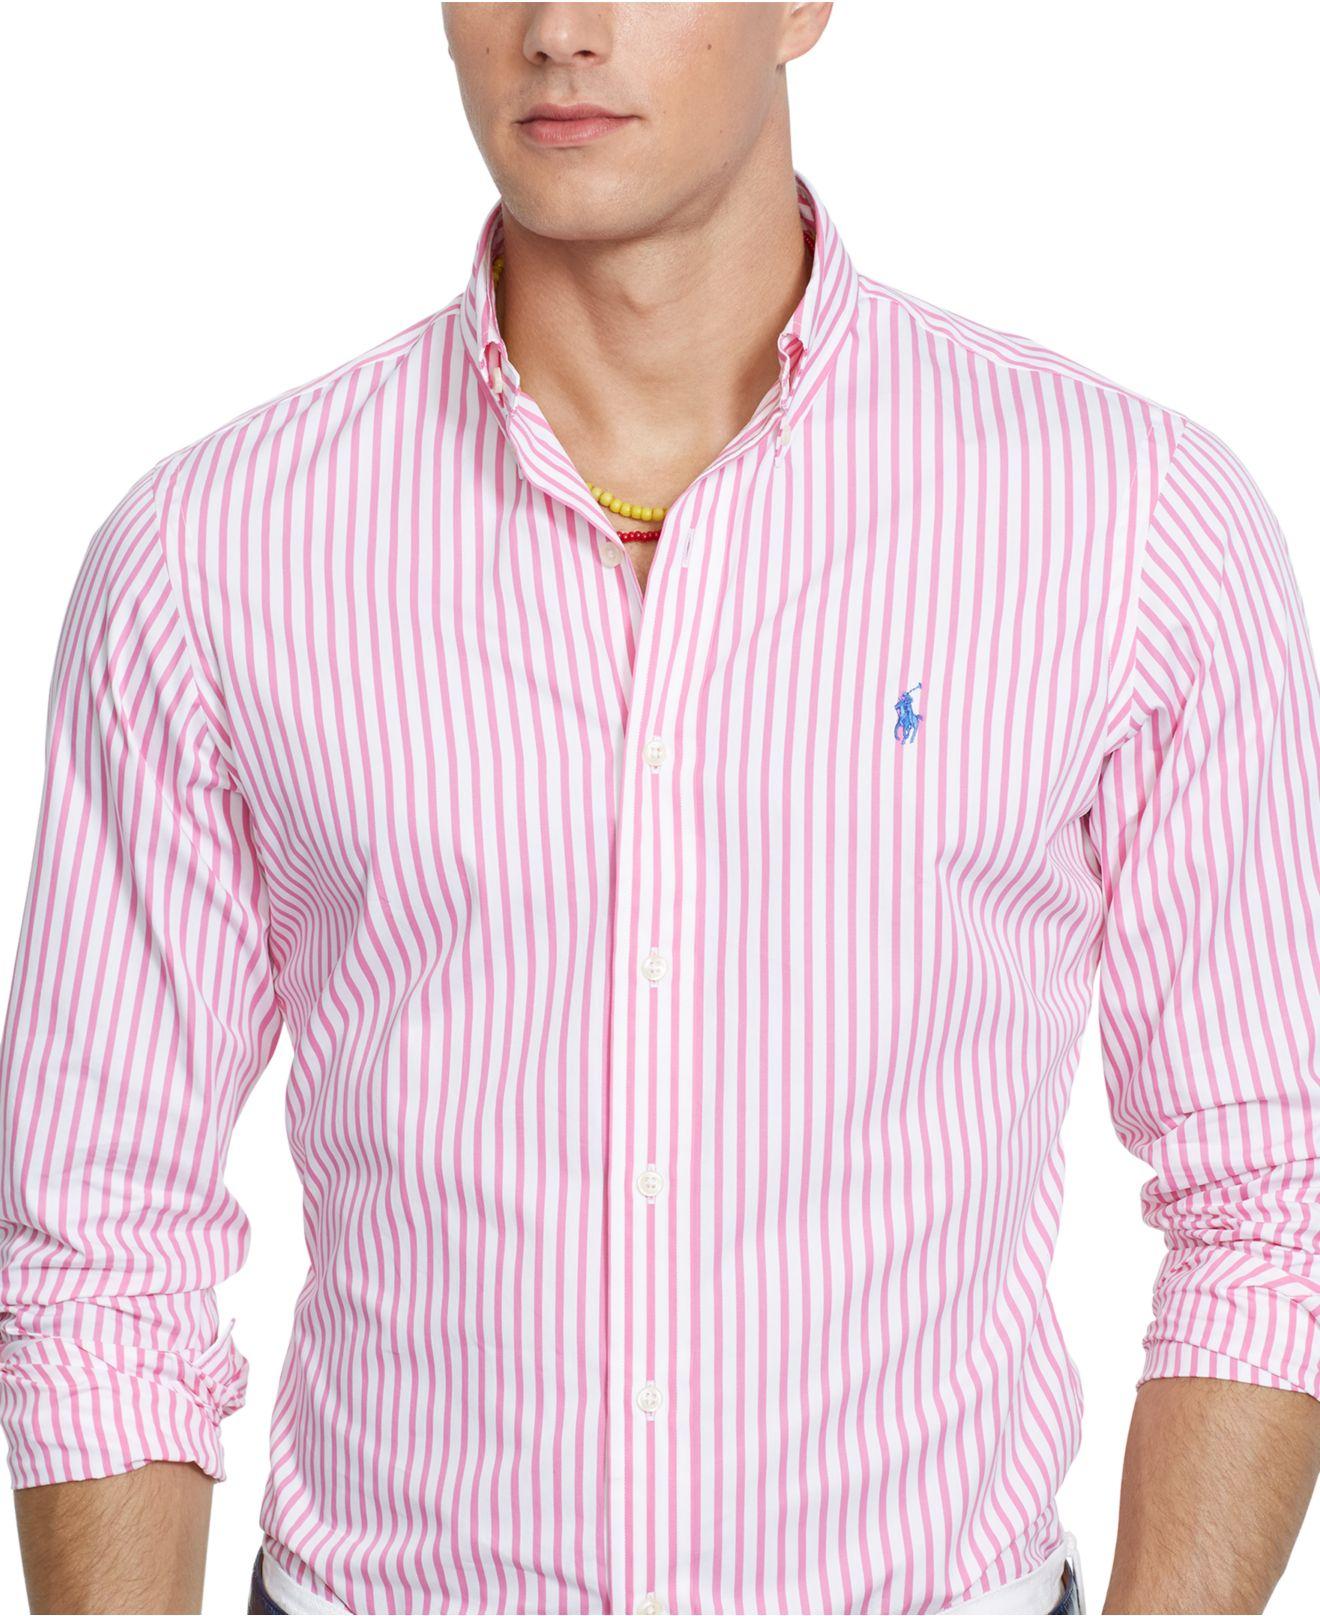 493c3f108 Polo Ralph Lauren Men s Long Sleeve Striped Poplin Shirt in Pink for ...